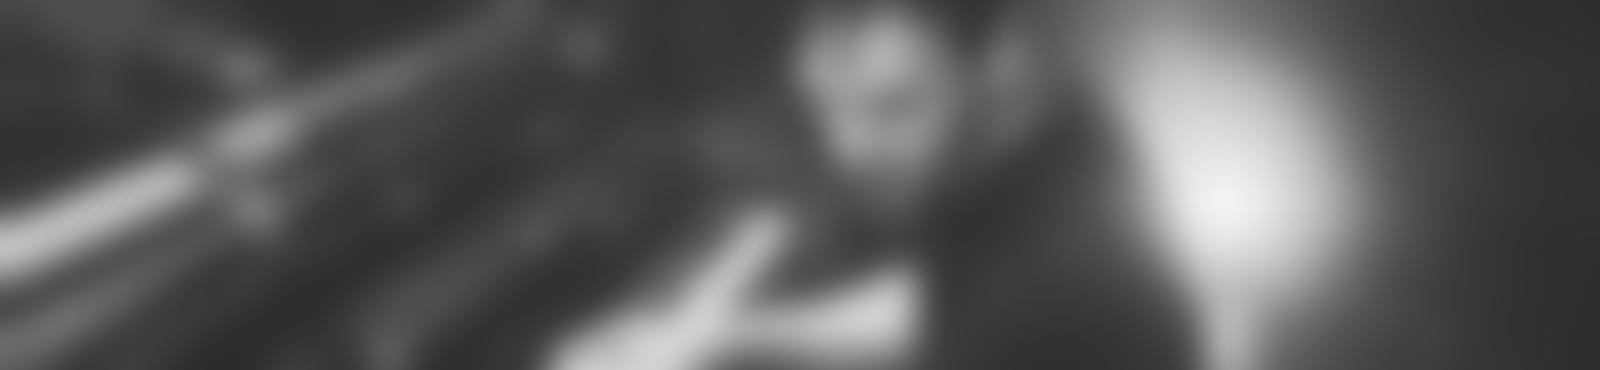 Blurred ceb788ee a870 4c2d 8c9c 5b64a5cda1bd